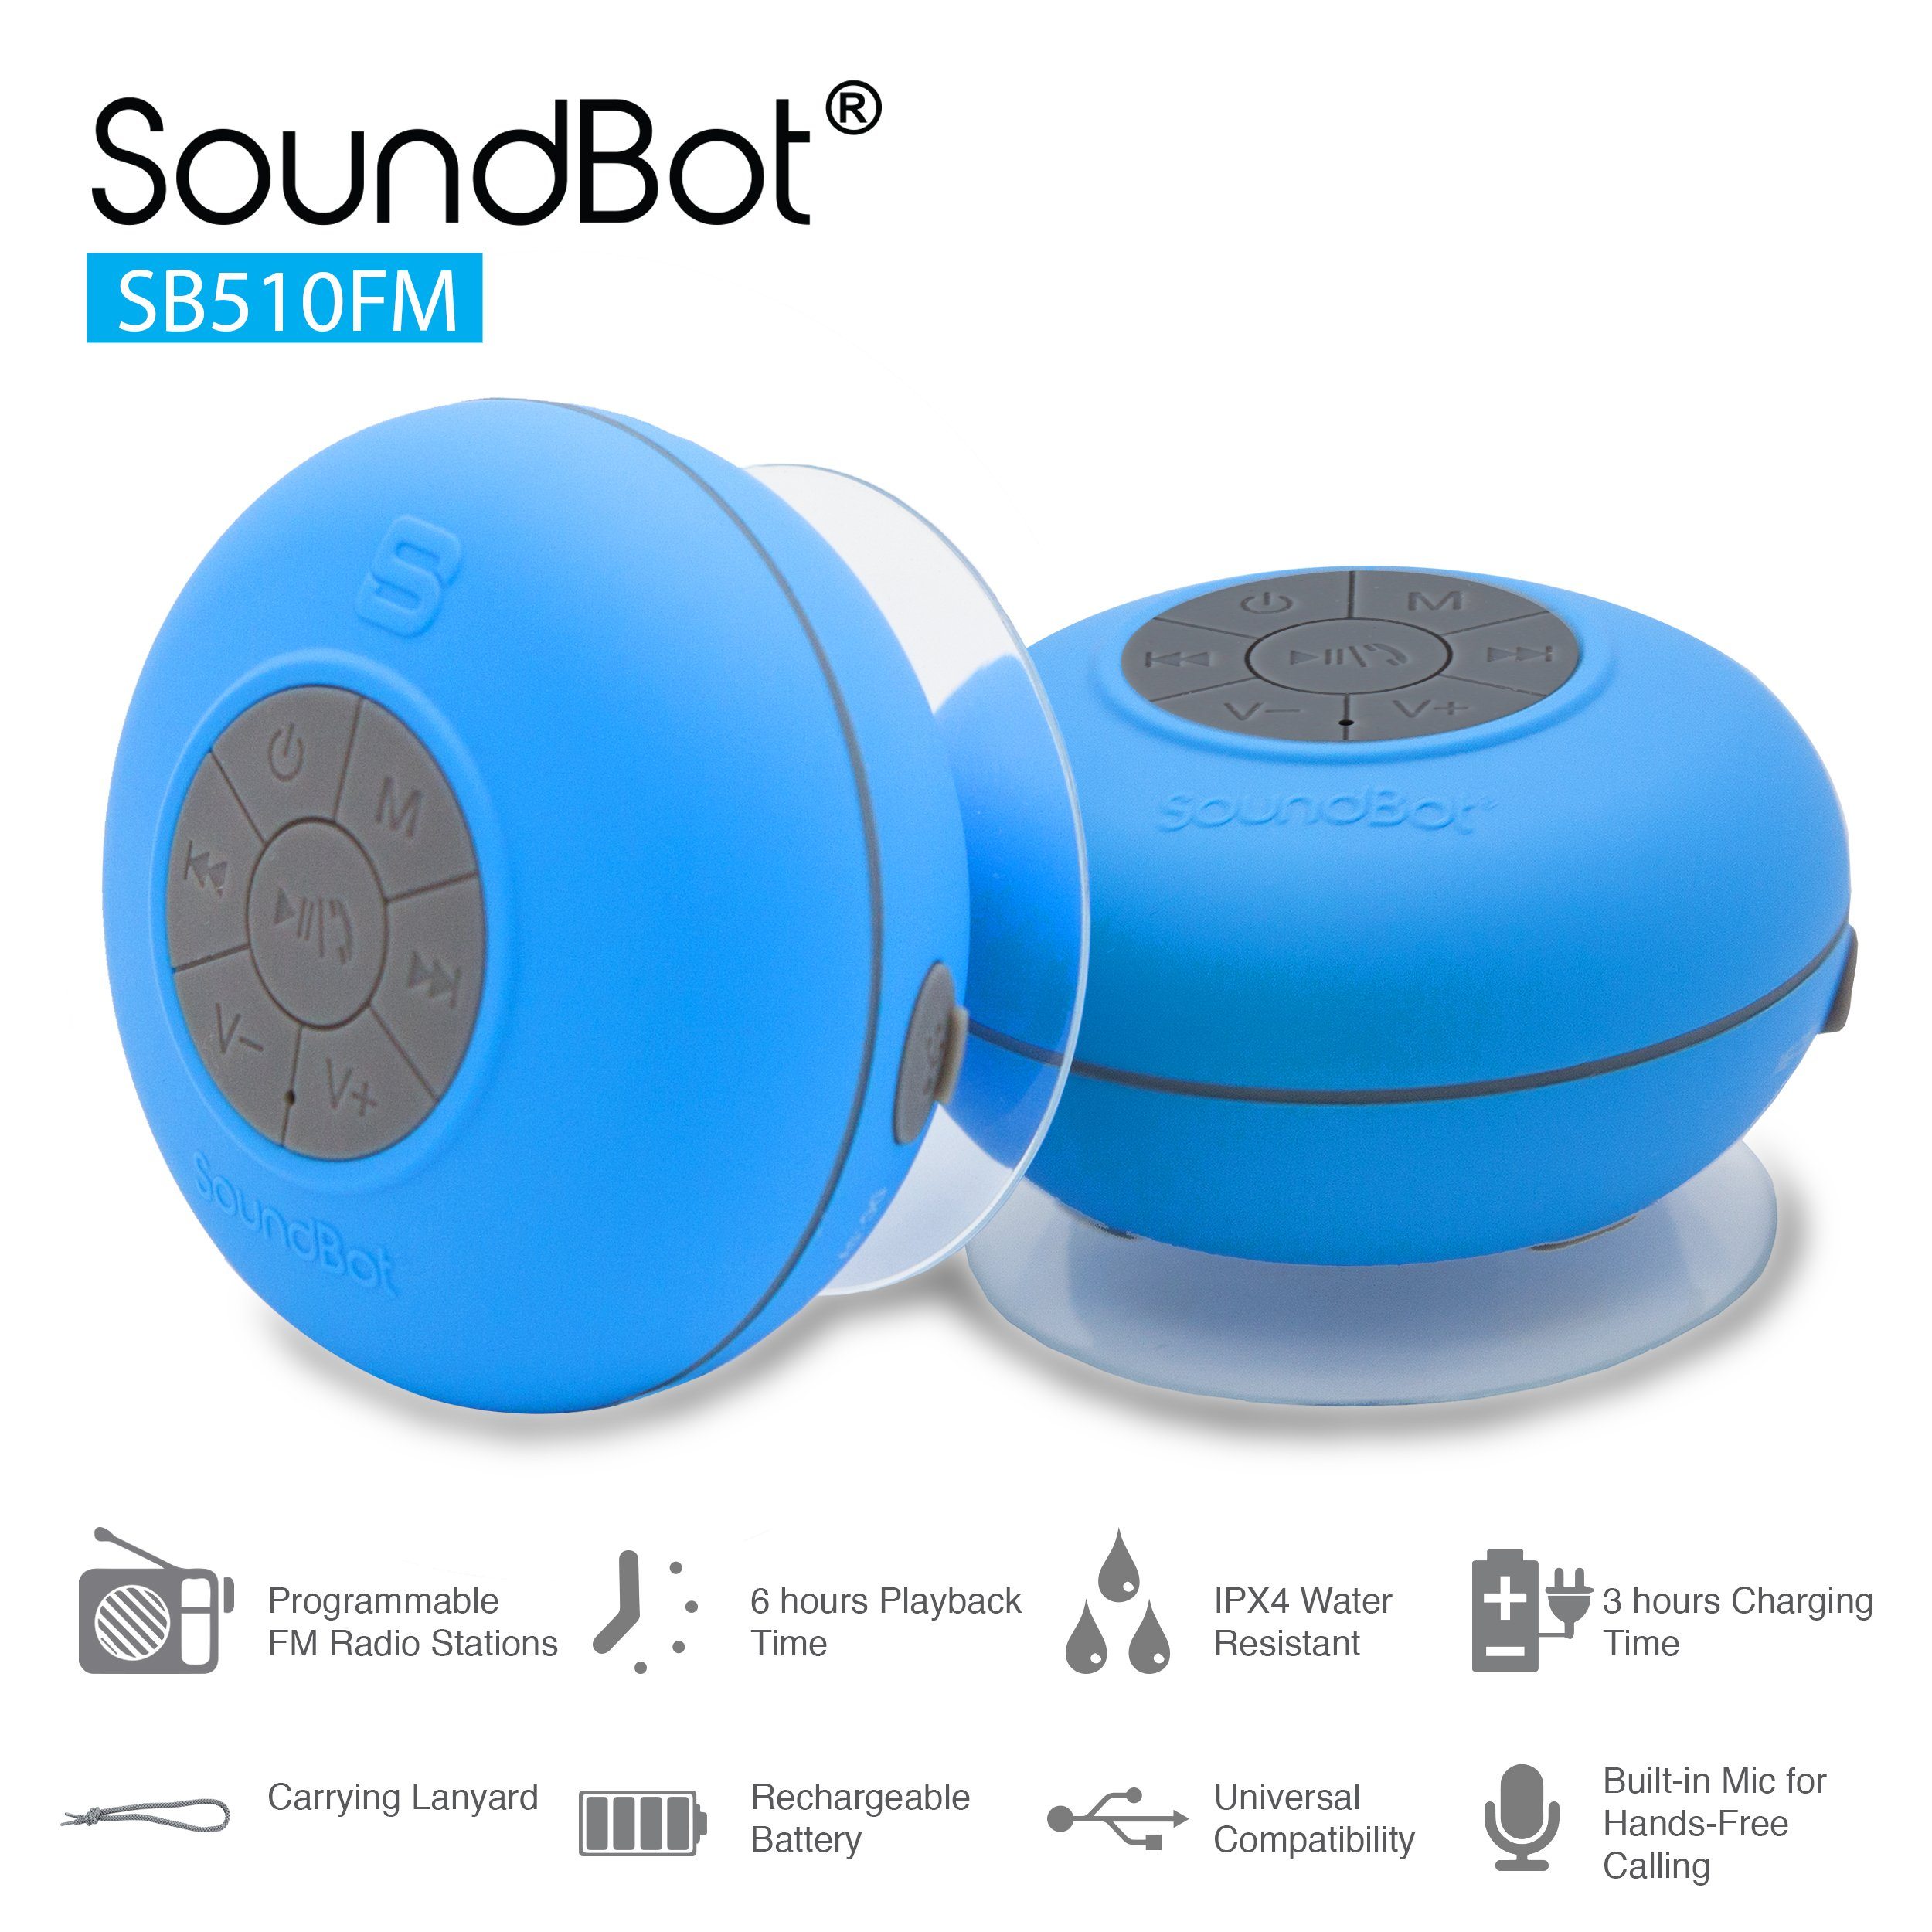 SoundBot® SB510FM FM RADIO Water Resistant Bluetooth Wireless 5W Shower Speaker HandsFree Portable Speakerphone w/ Auto-Scan Tuner, 6Hrs Music Streaming, Built-in Mic, Detachable Suction Cup, Lanyard